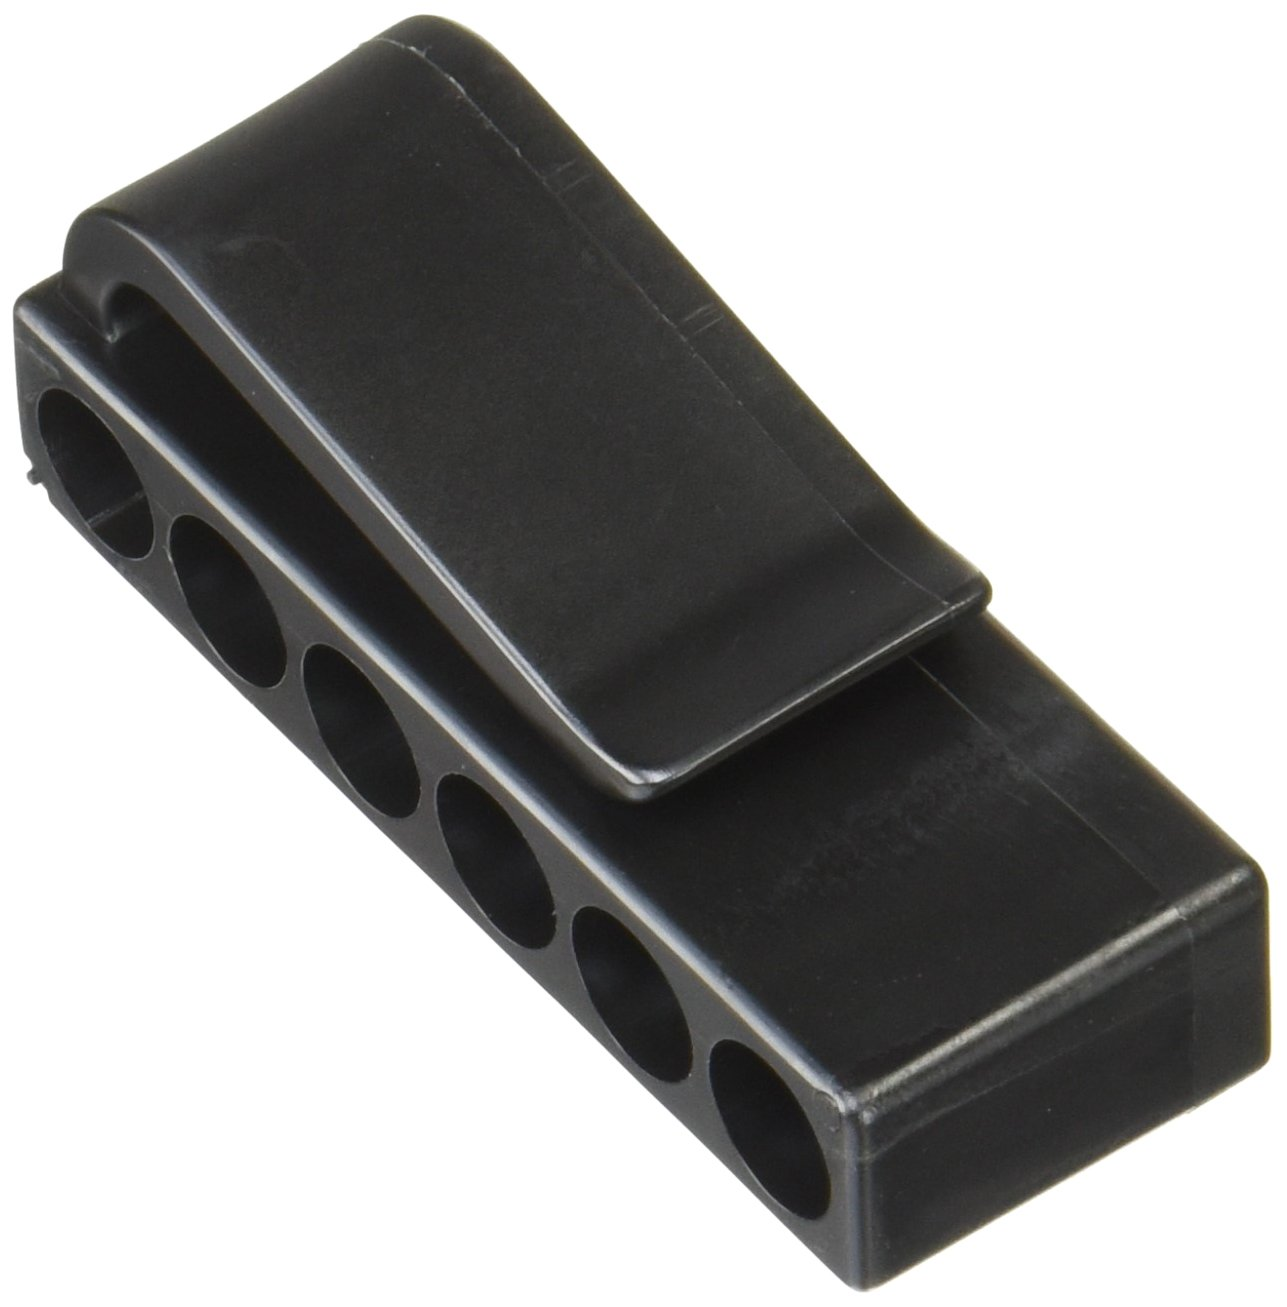 KTC(ケーテーシー) 板ラチェット差替えドライバー ビットホルダー EHDB06